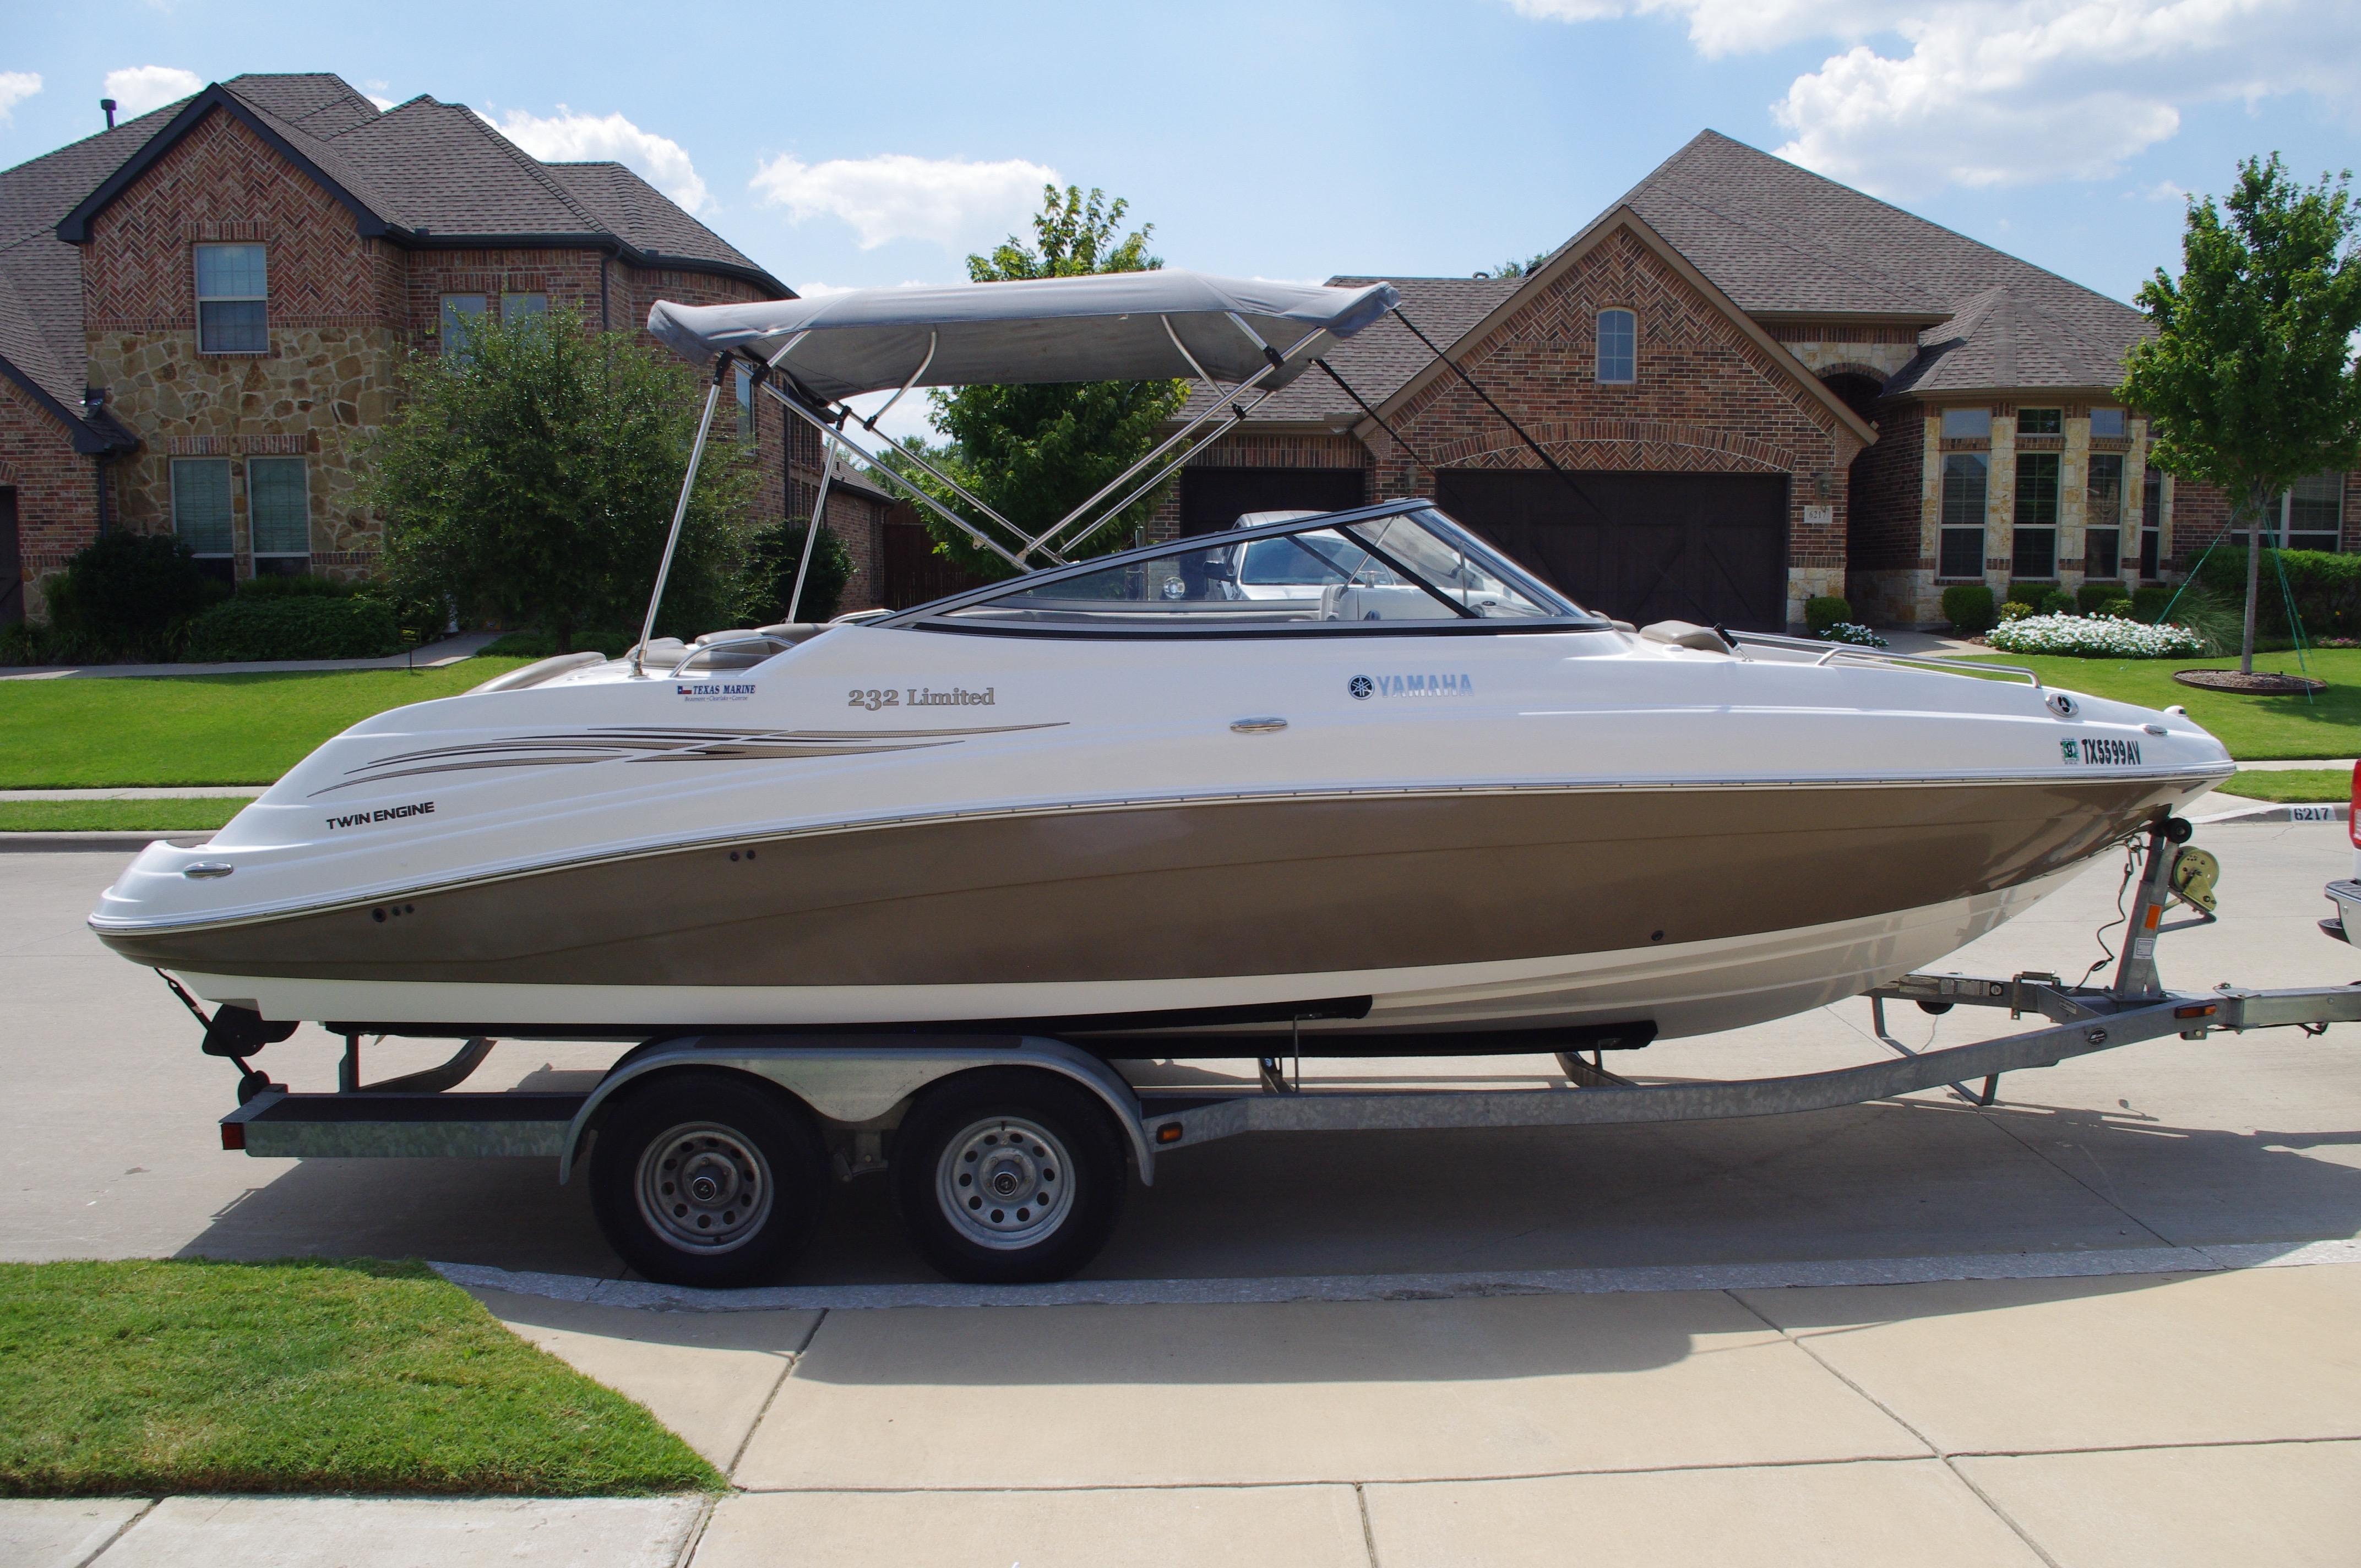 Yamaha Boats 232 Limited